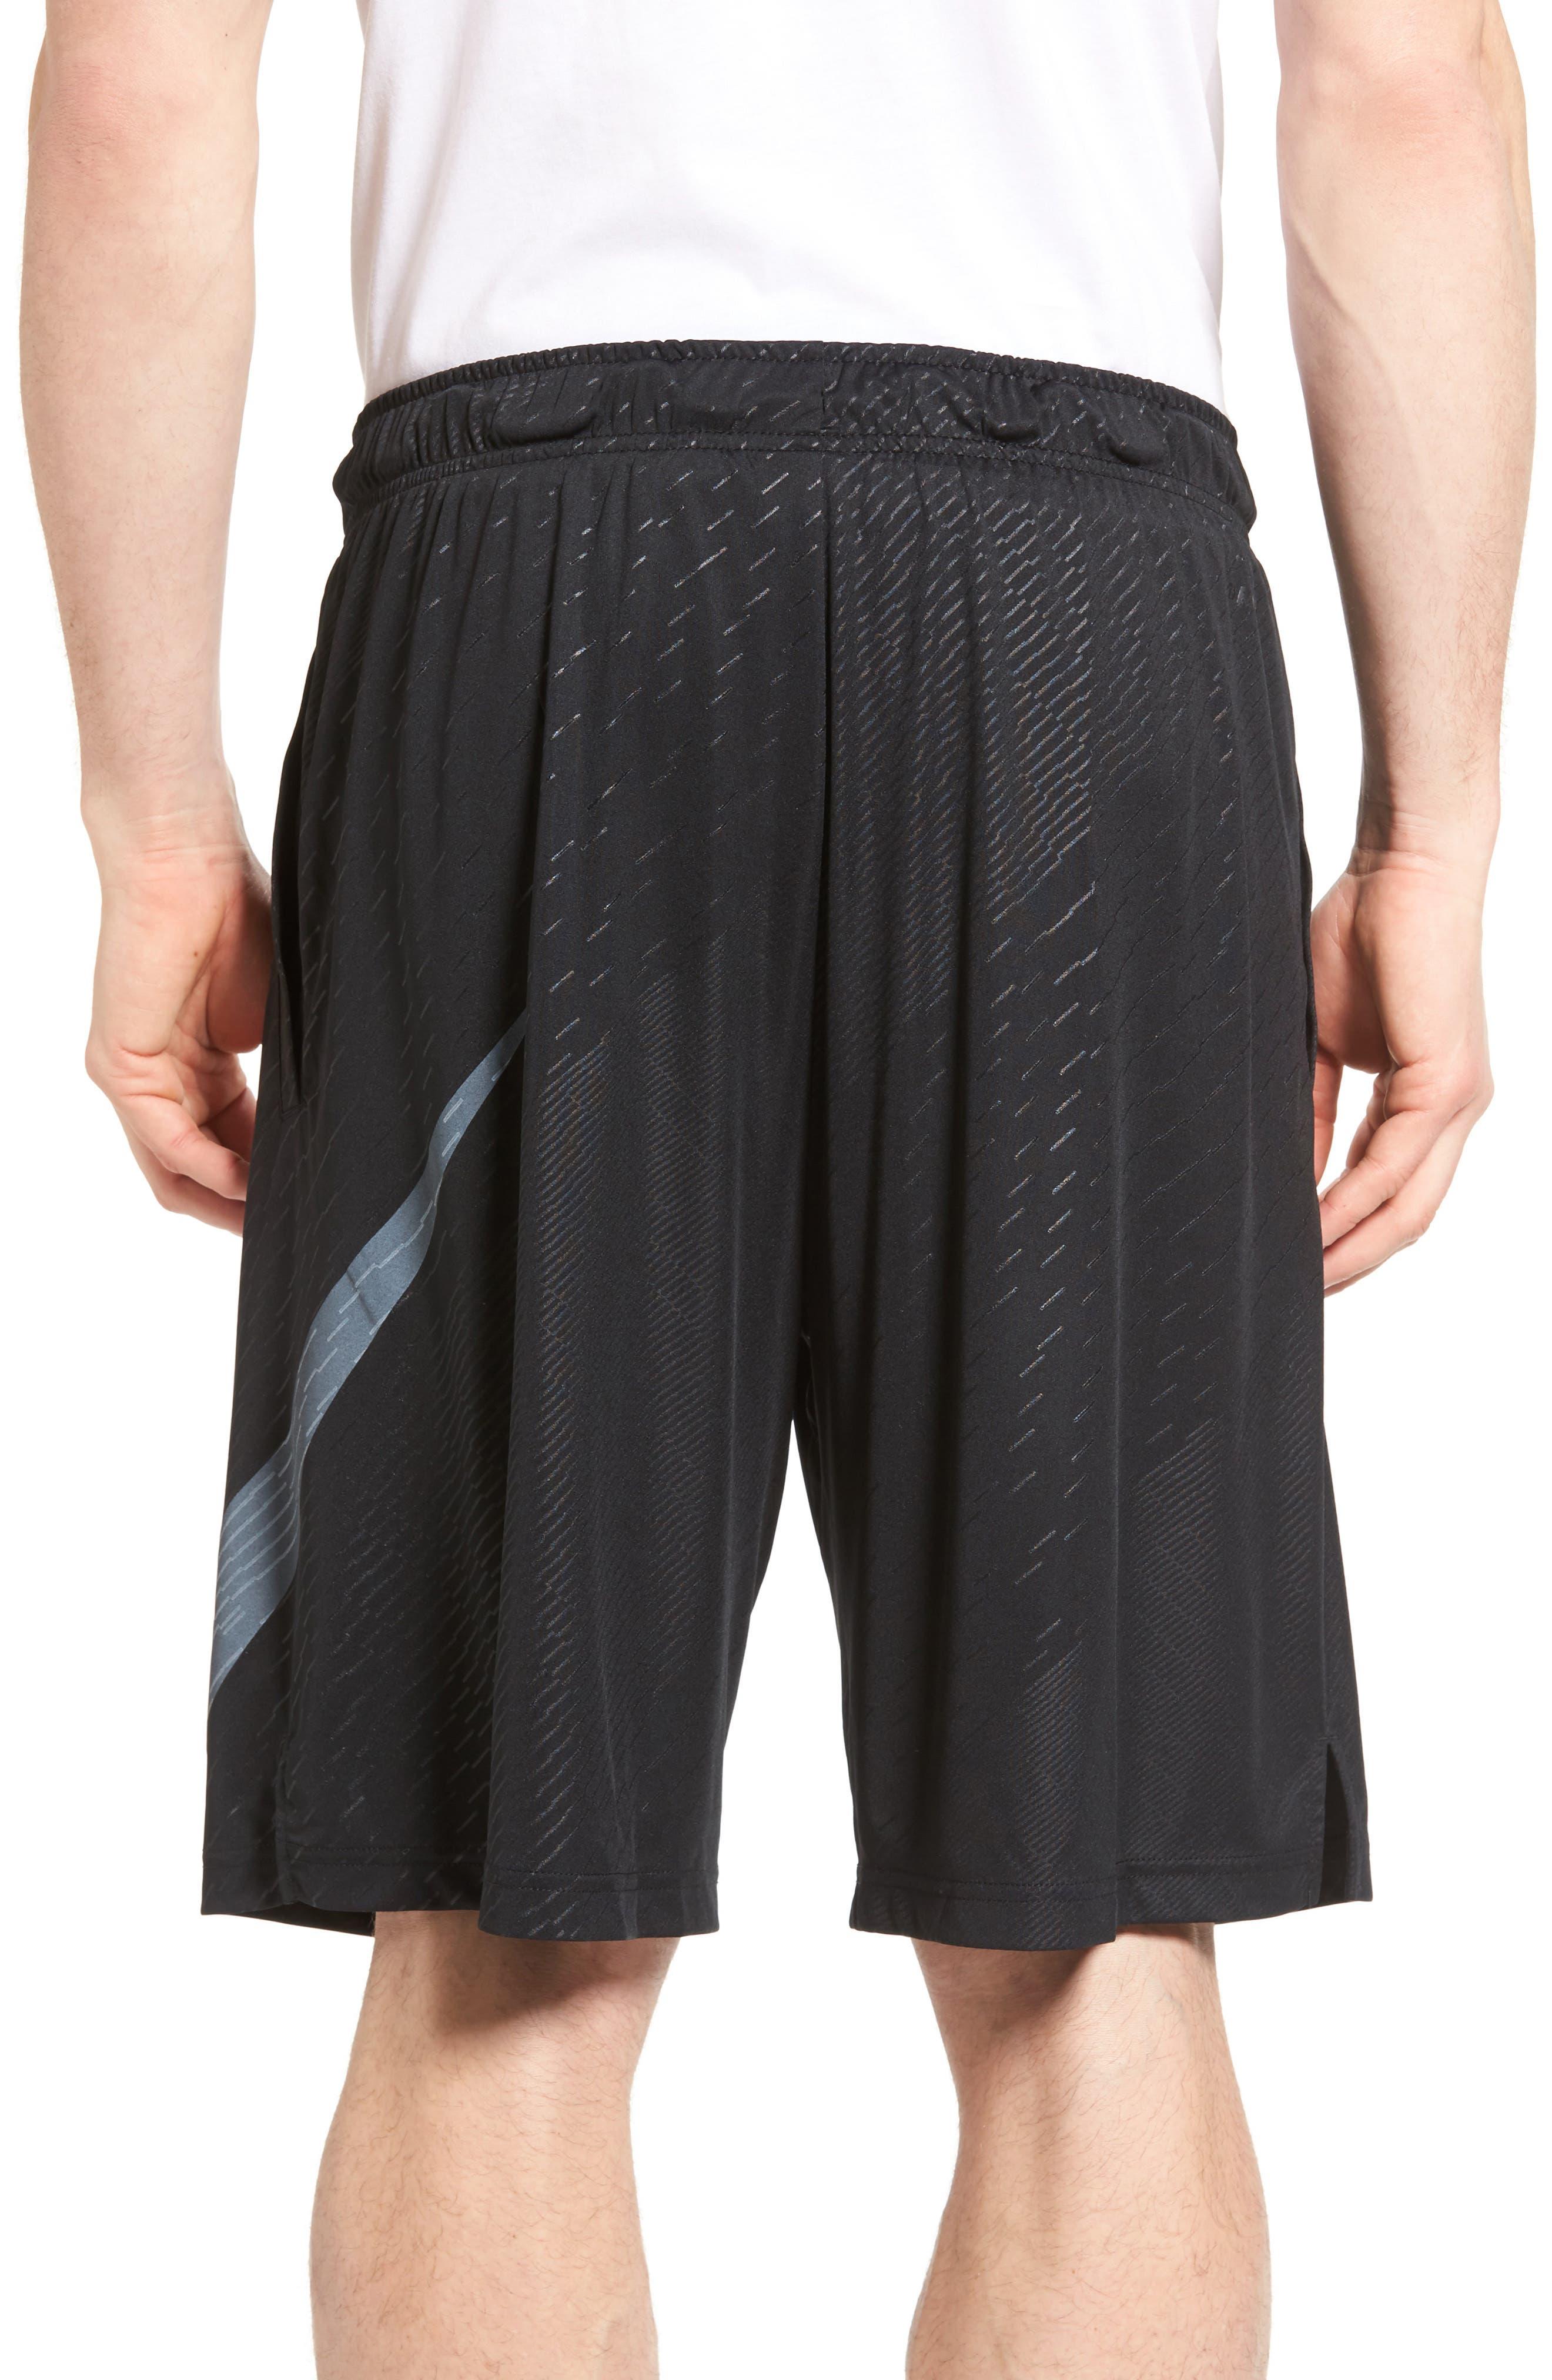 Dry Training Shorts,                             Alternate thumbnail 2, color,                             010